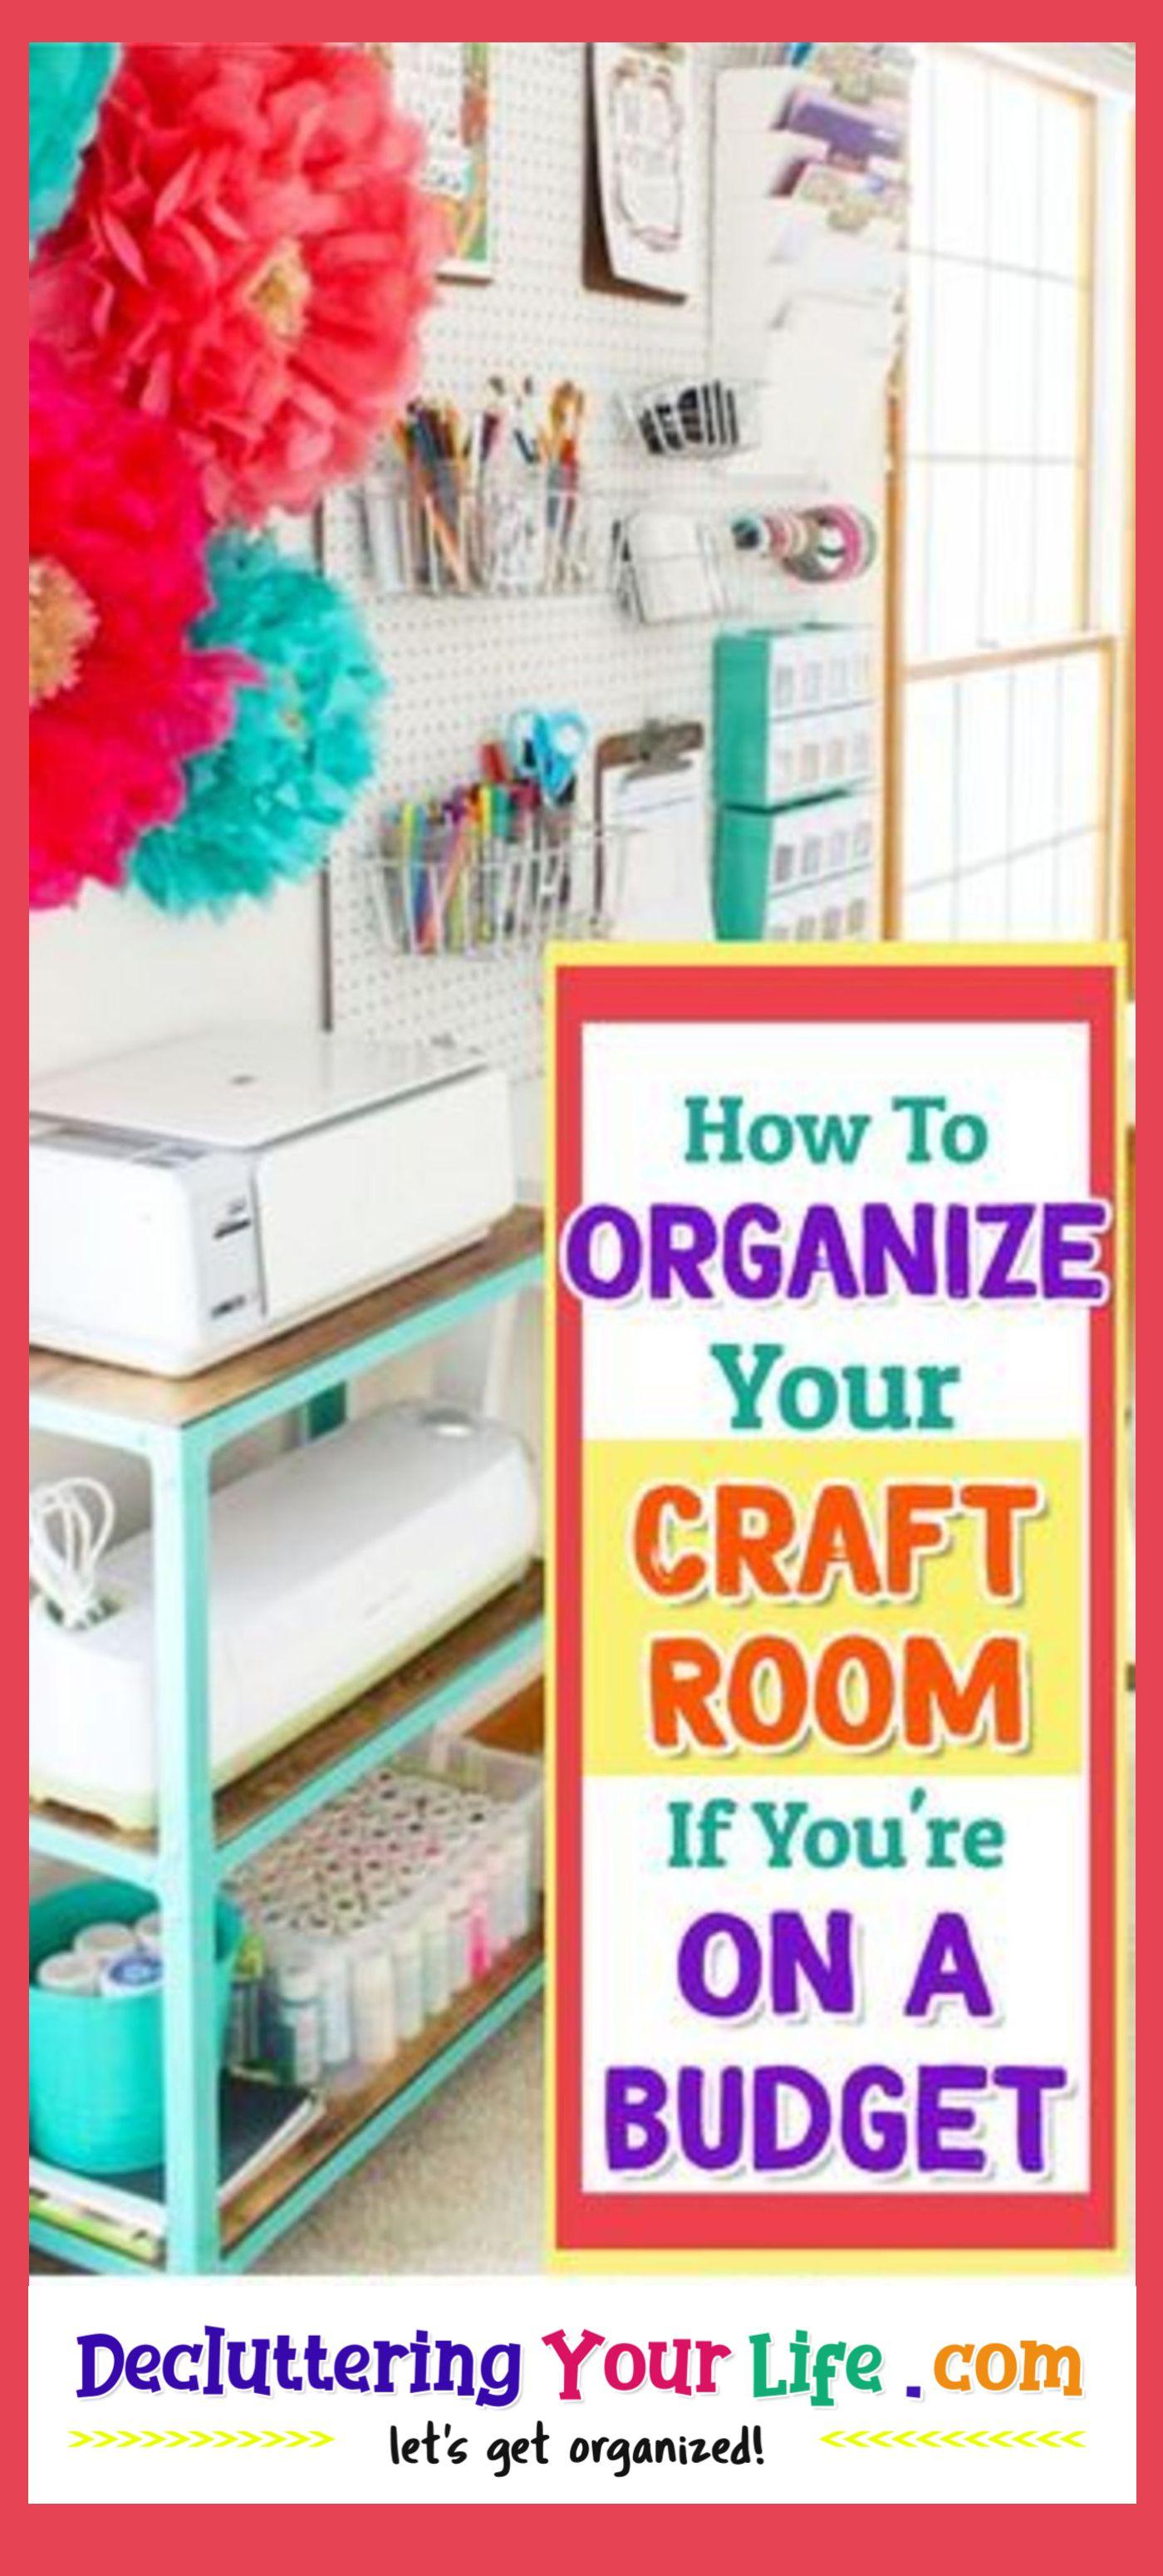 Declutter Challenge Week Craft Room Organizing Ideas Clever Diy Organization Hacks Fo In 2020 Craft Room Ideas On A Budget Craft Storage Diy Organize Craft Supplies